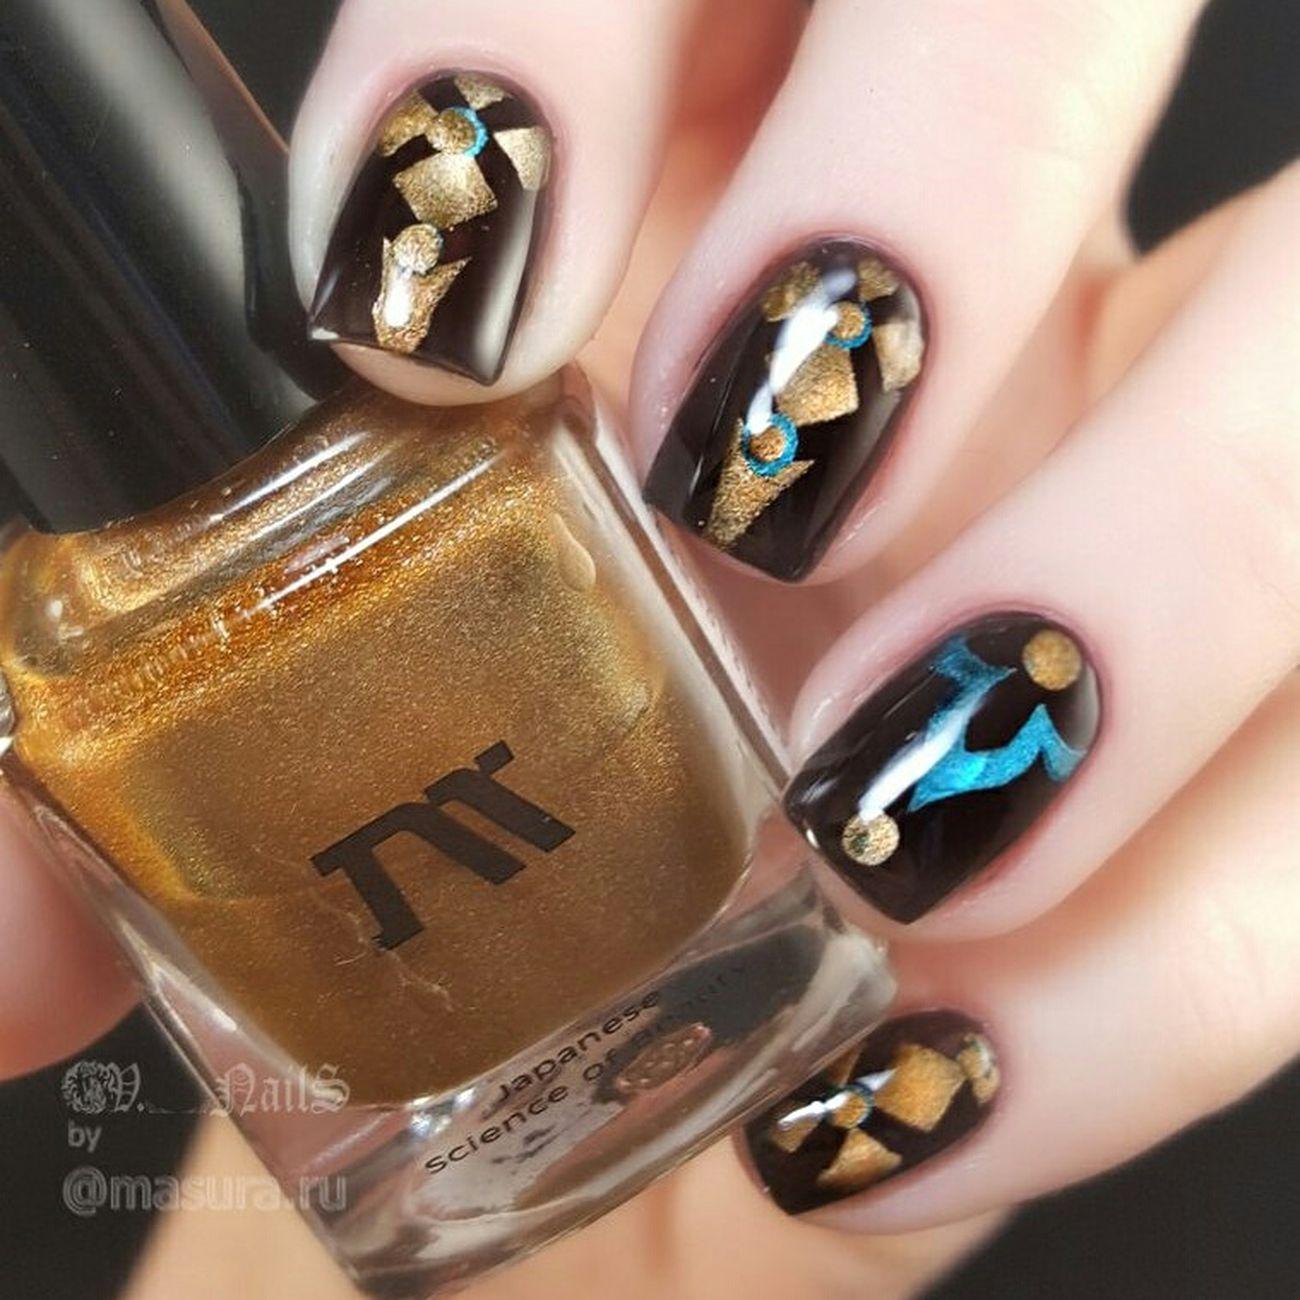 masura nails nailart nail polish маникюр  лак Magneticnailpolish Sechevite